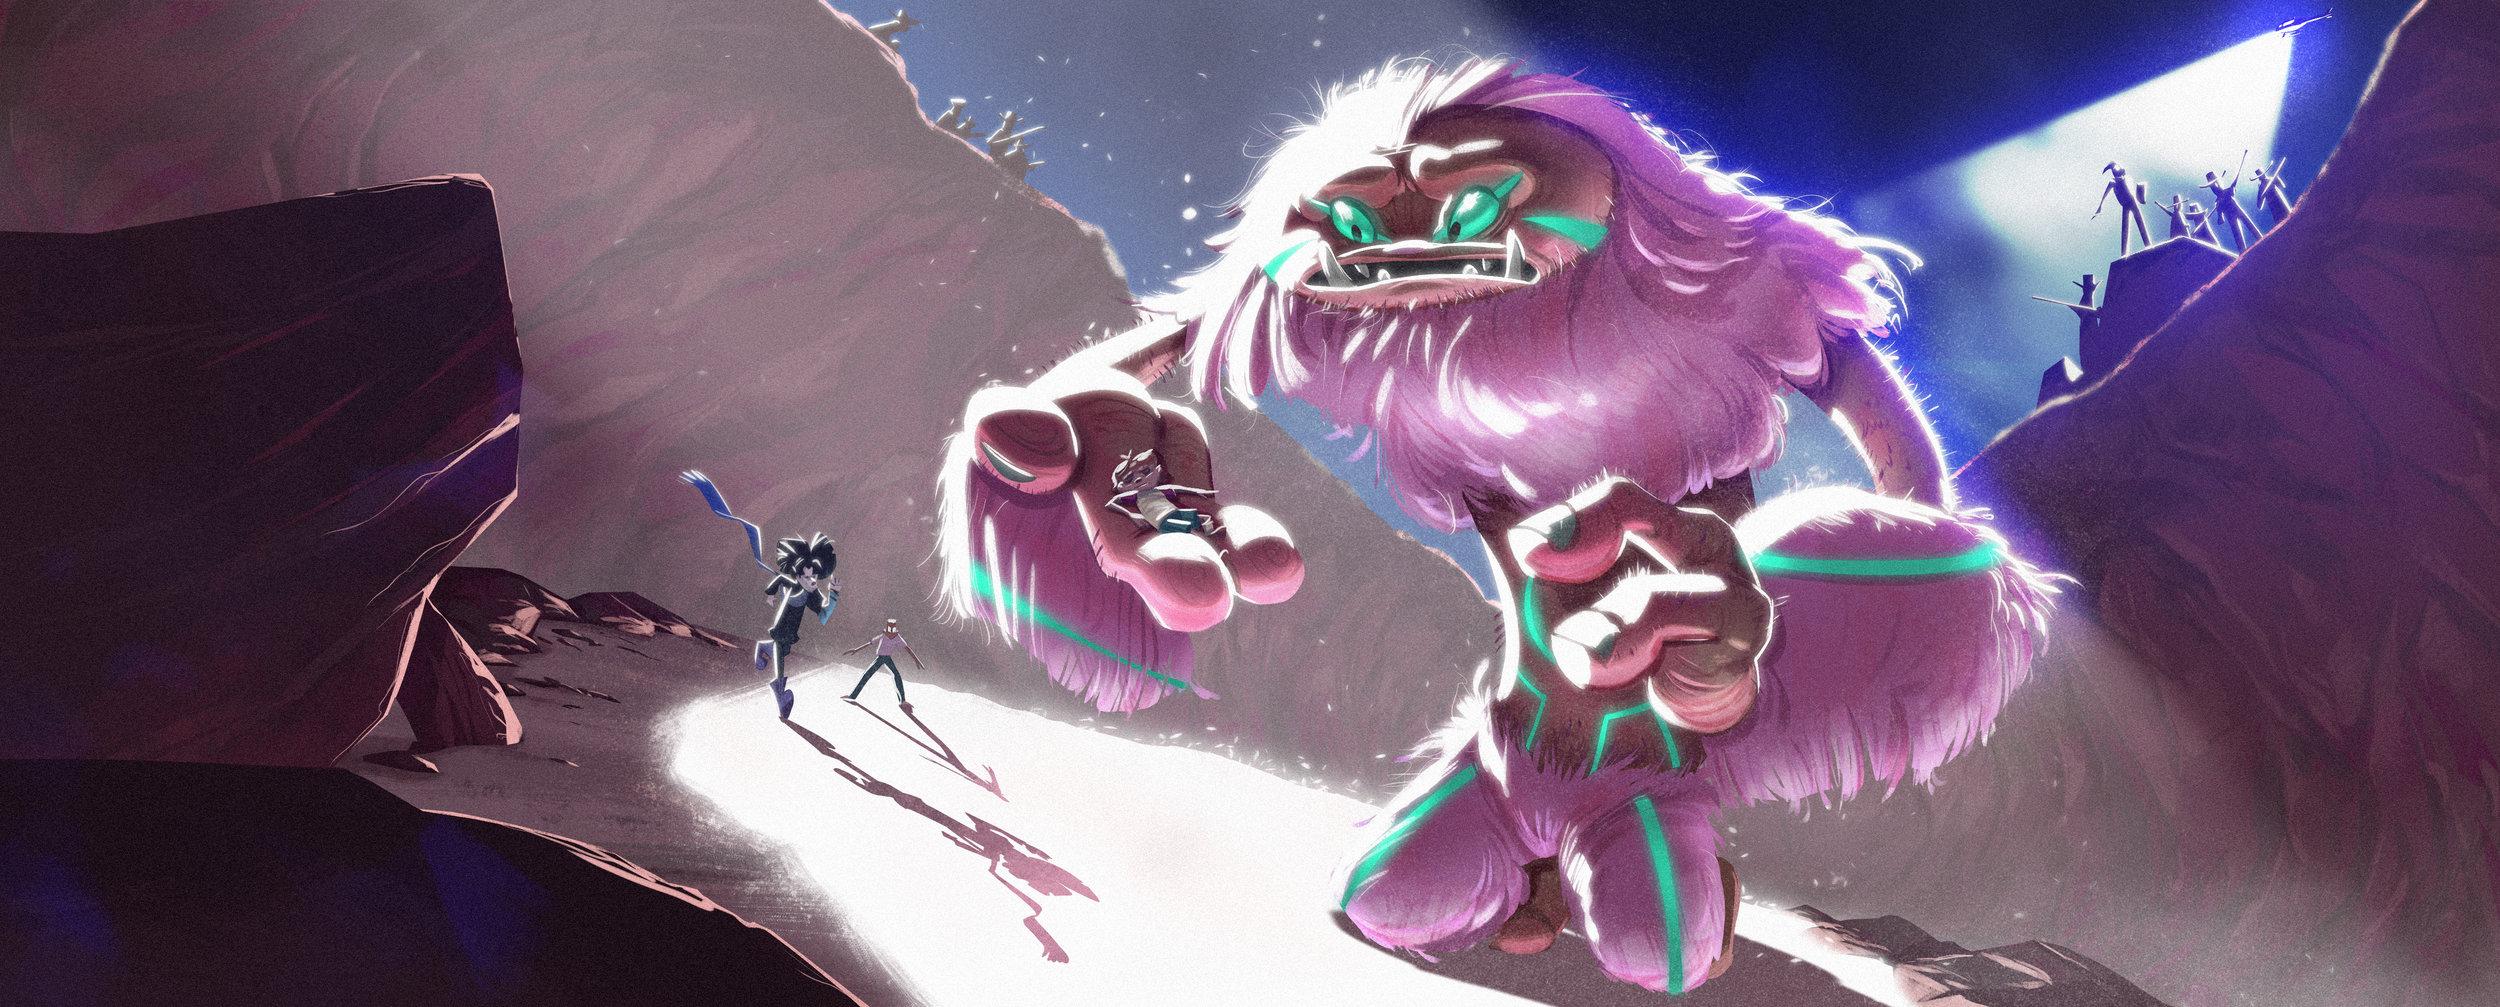 BigfootSAD_FINAL.jpg